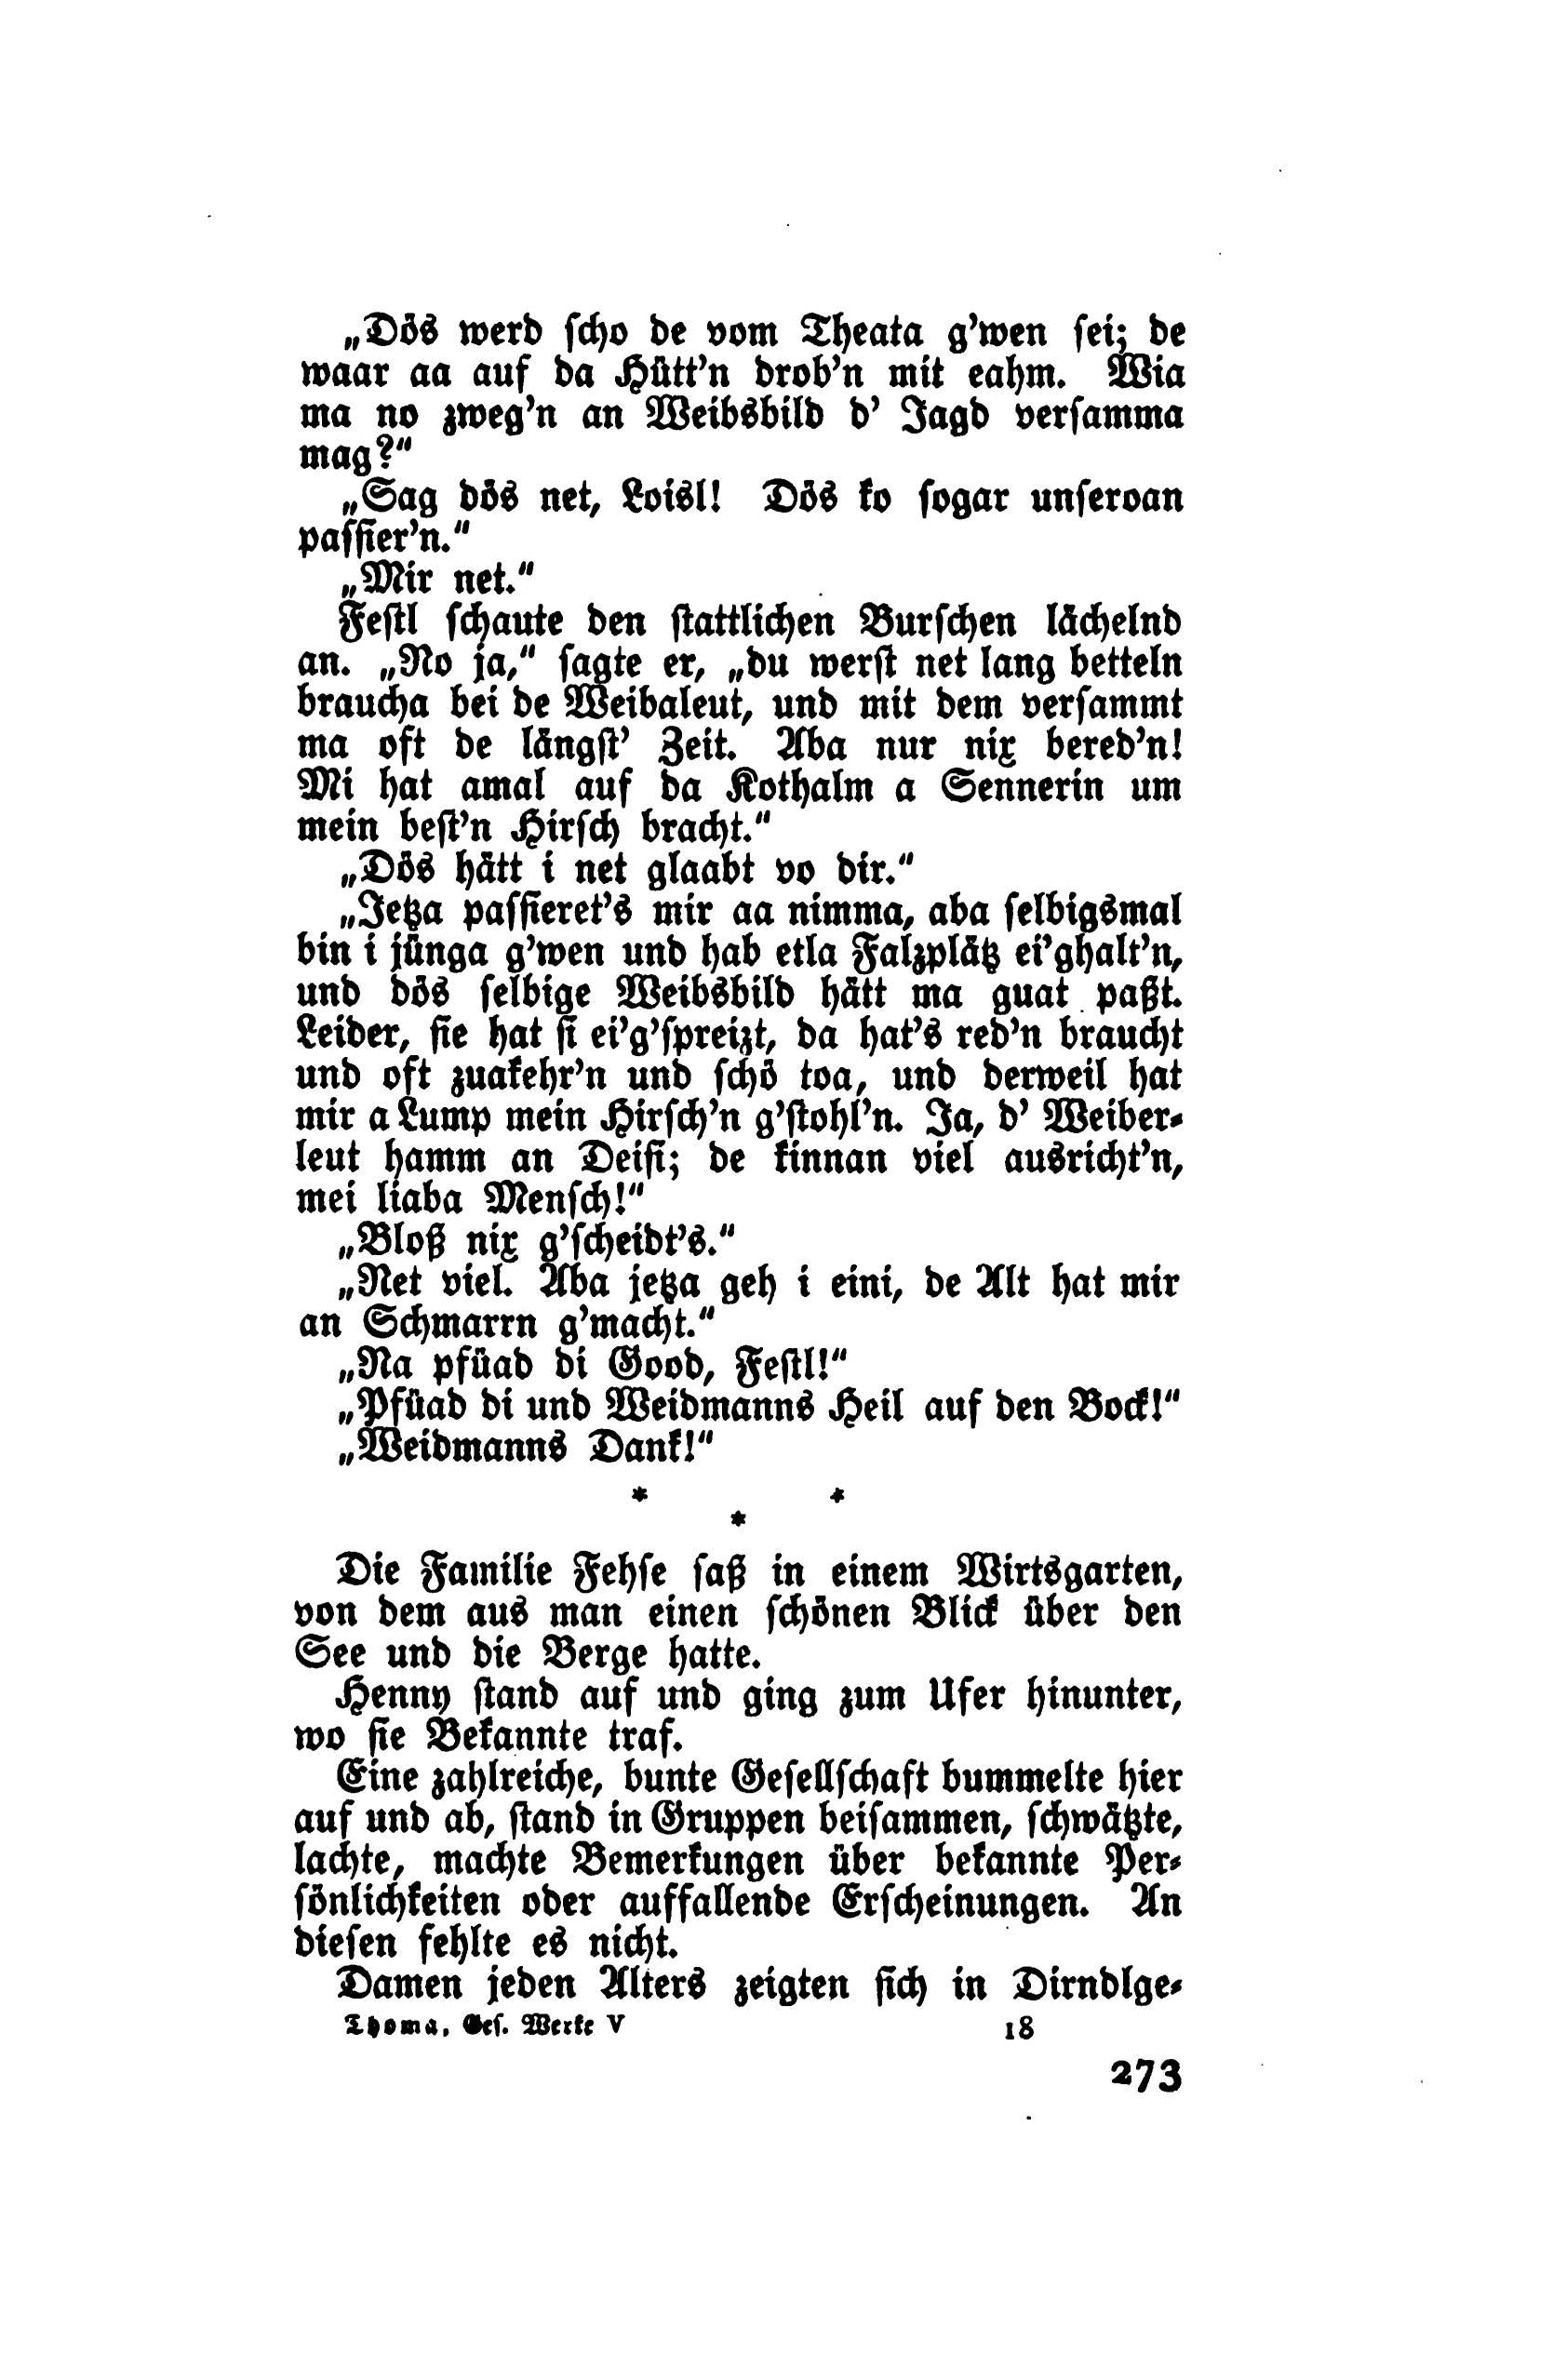 File:Gesammelte Werke (Thoma) 5 273.jpg - Wikimedia Commons